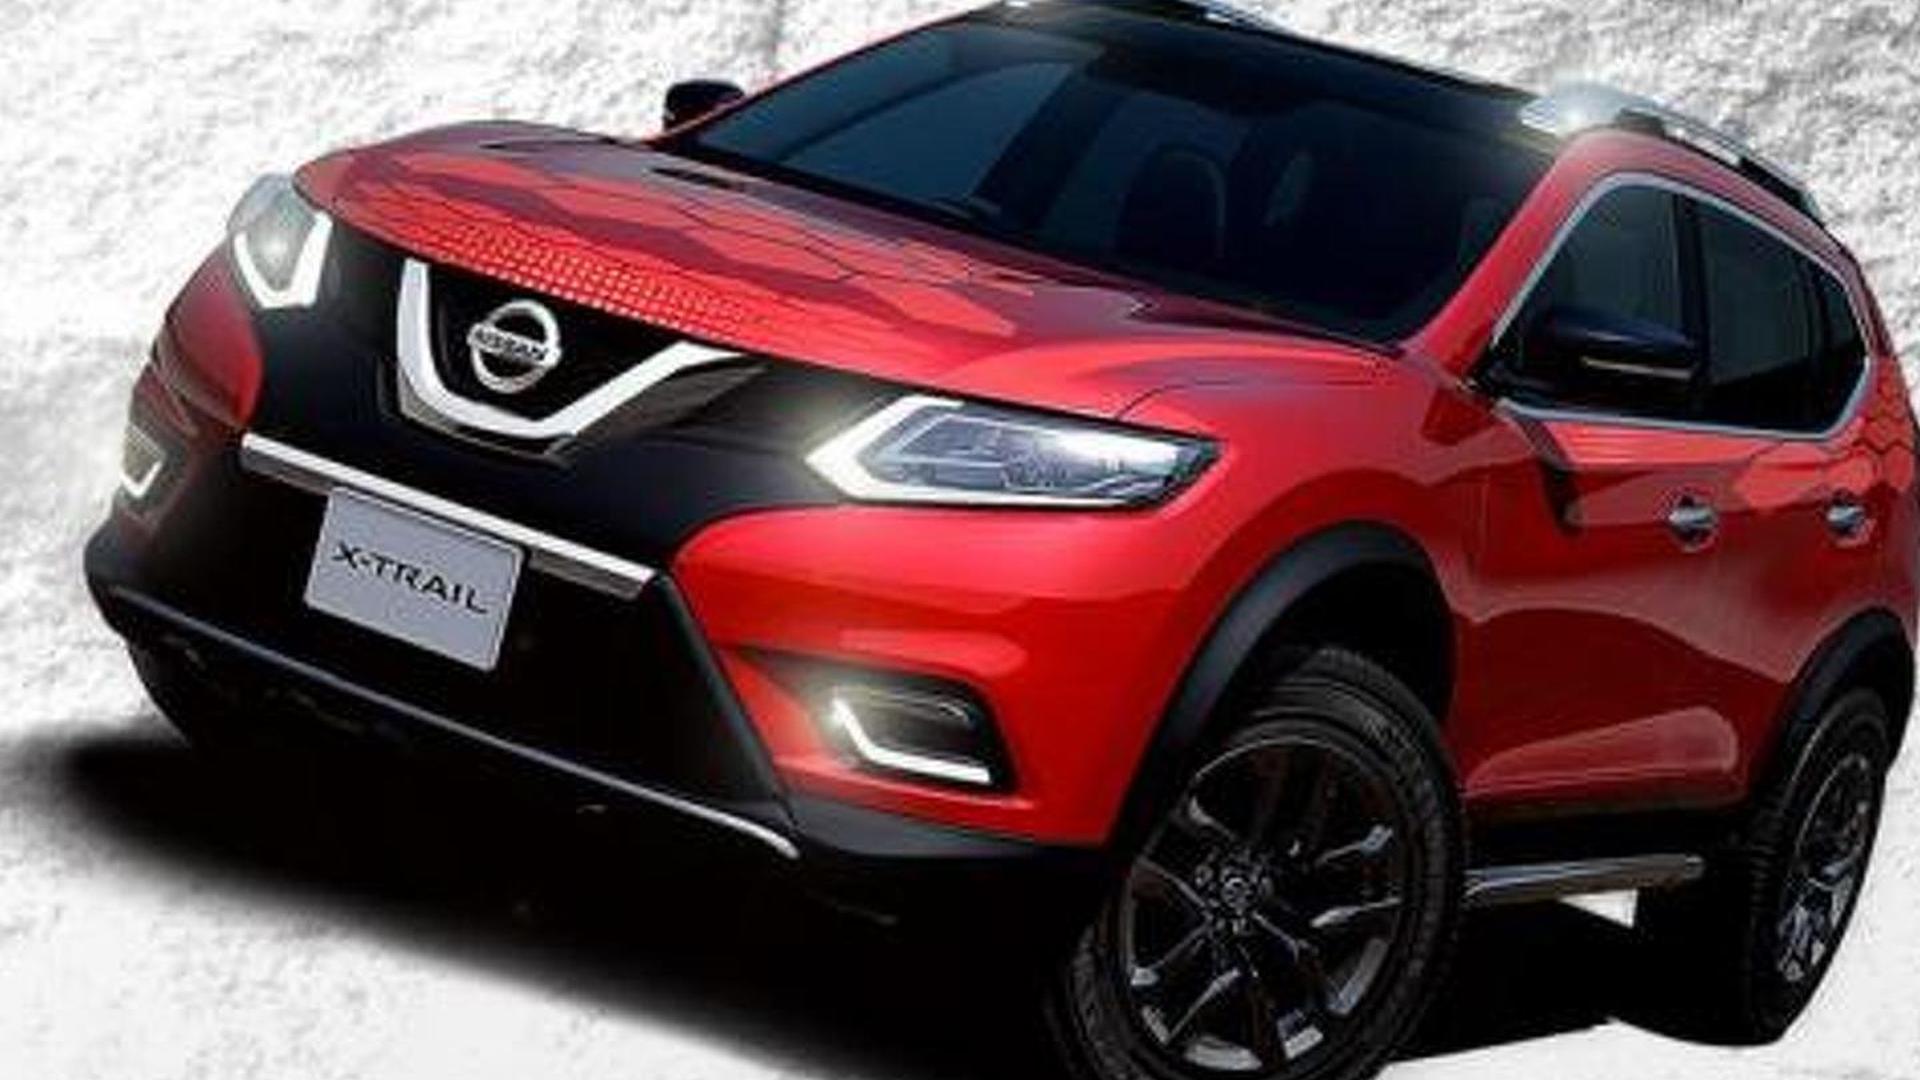 Nissan to showcase ten models at the Tokyo Auto Salon